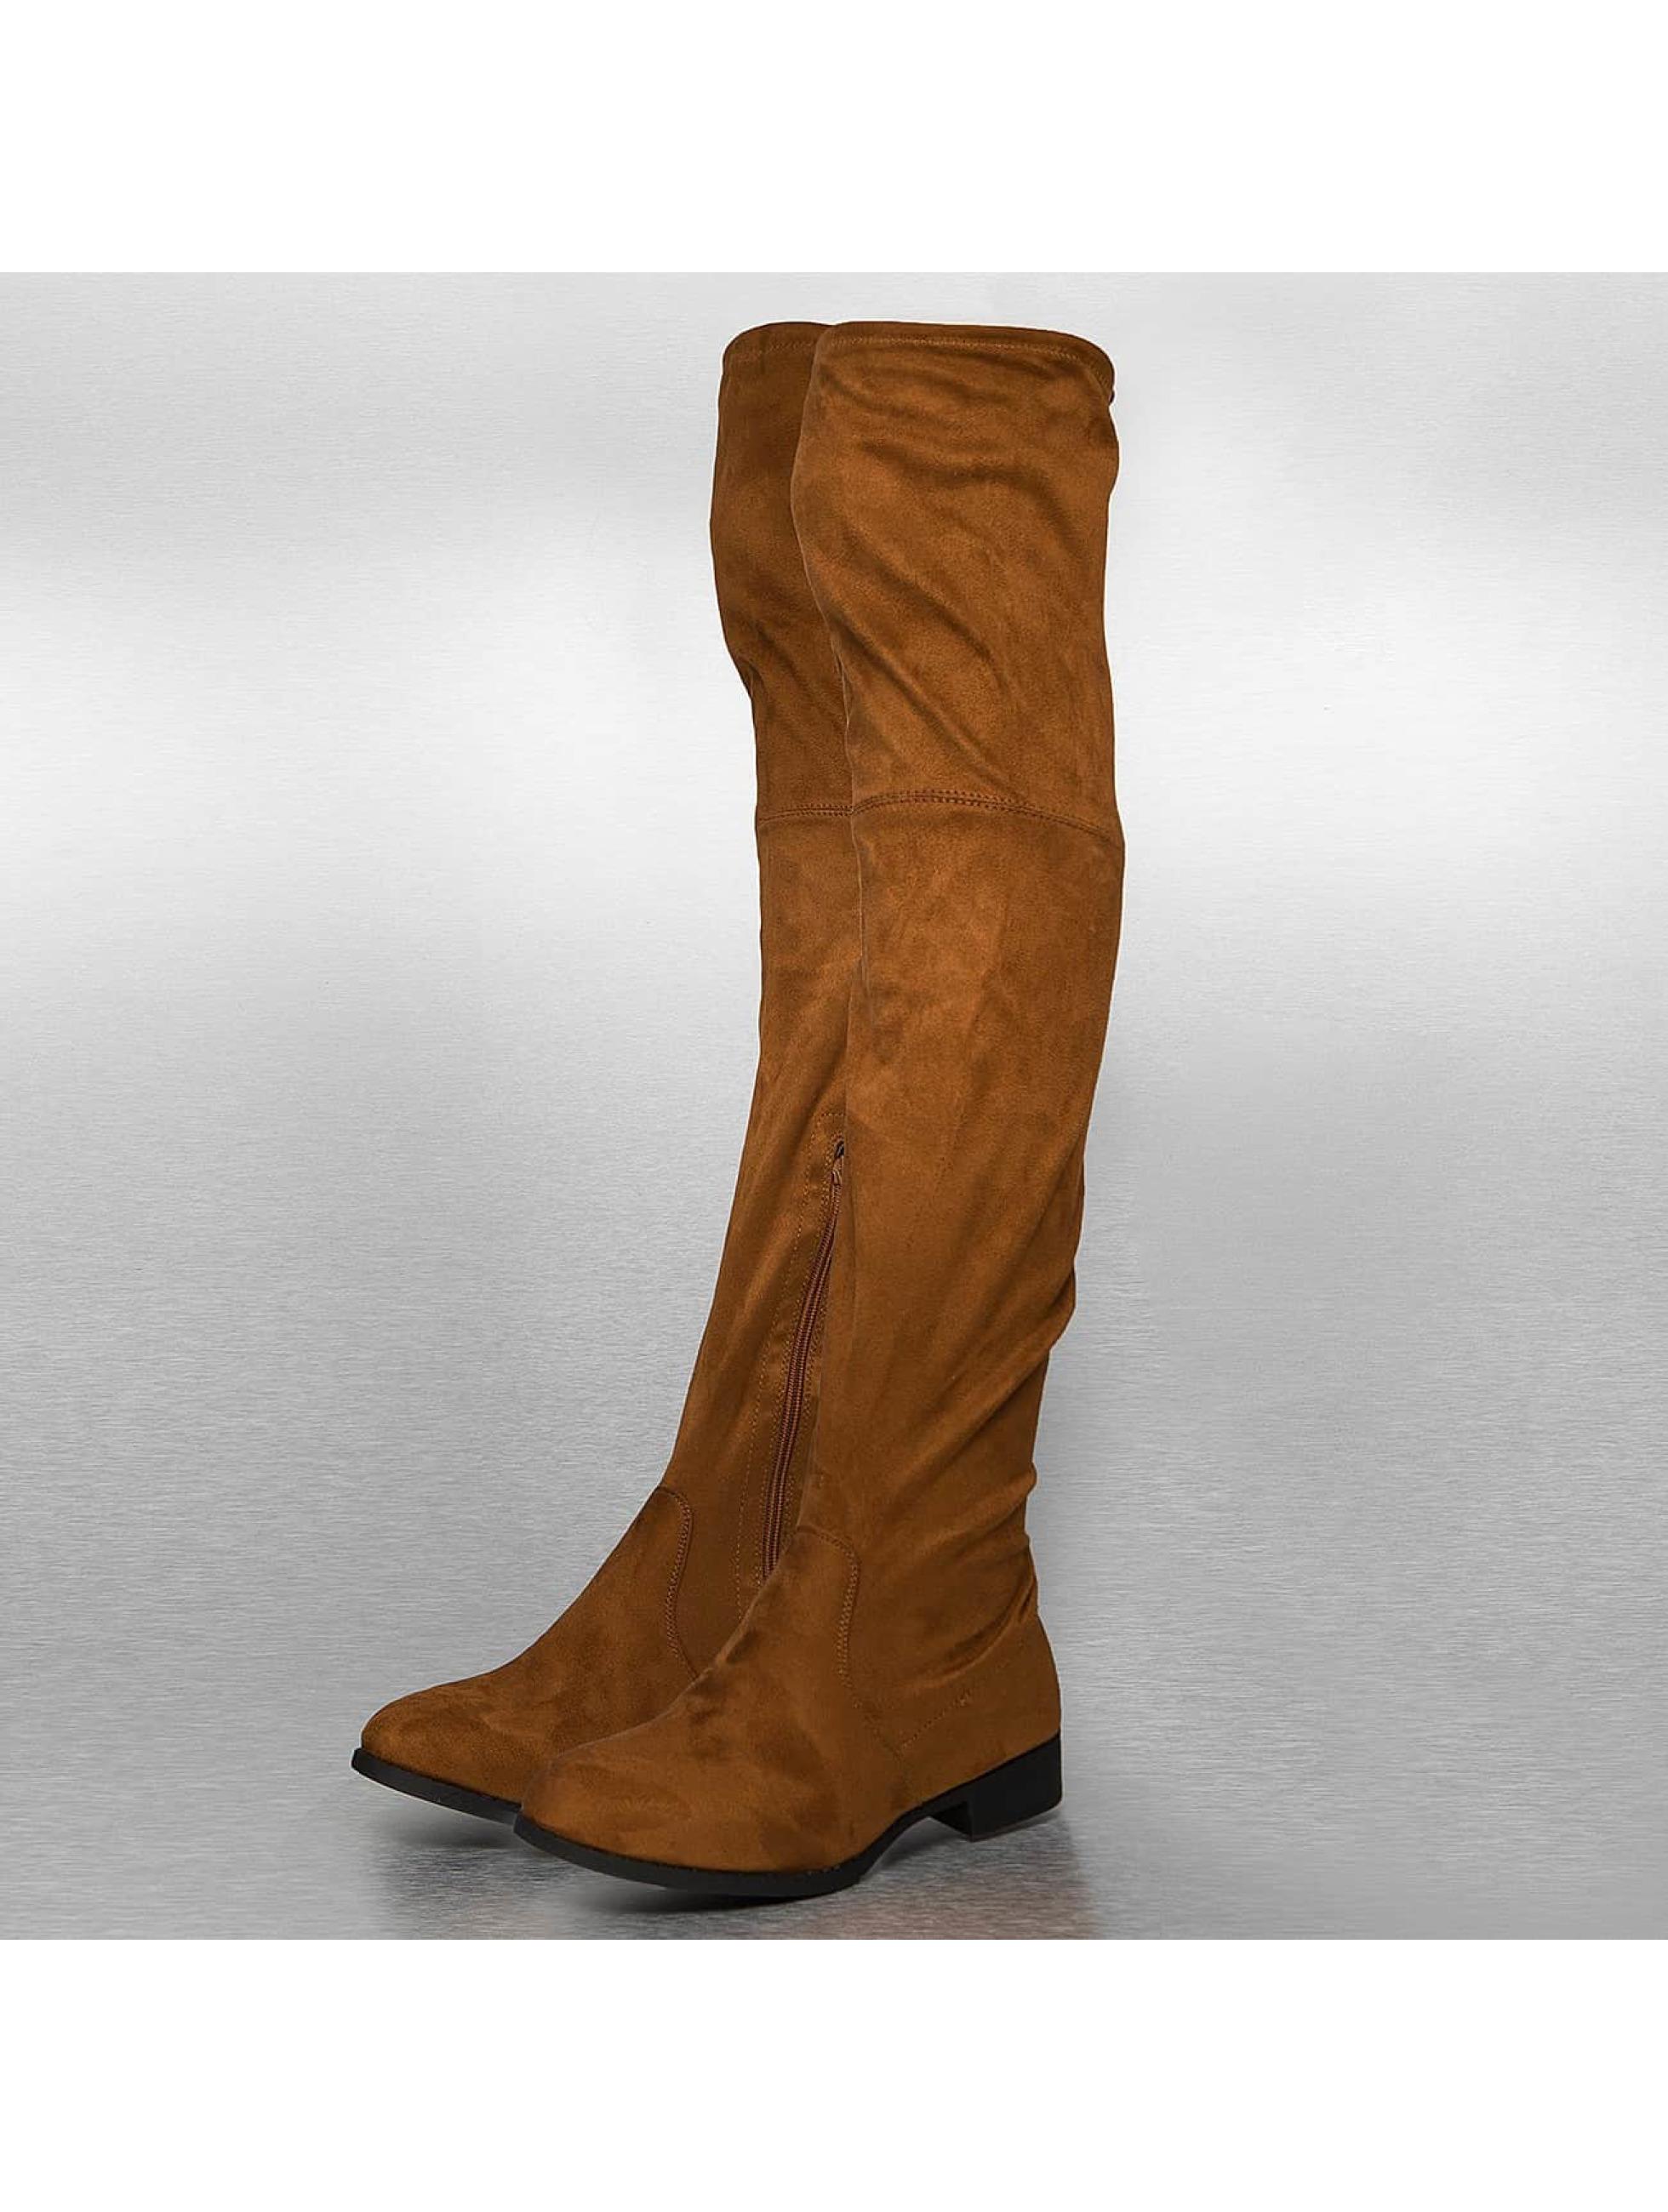 Stiefel Overknees in braun